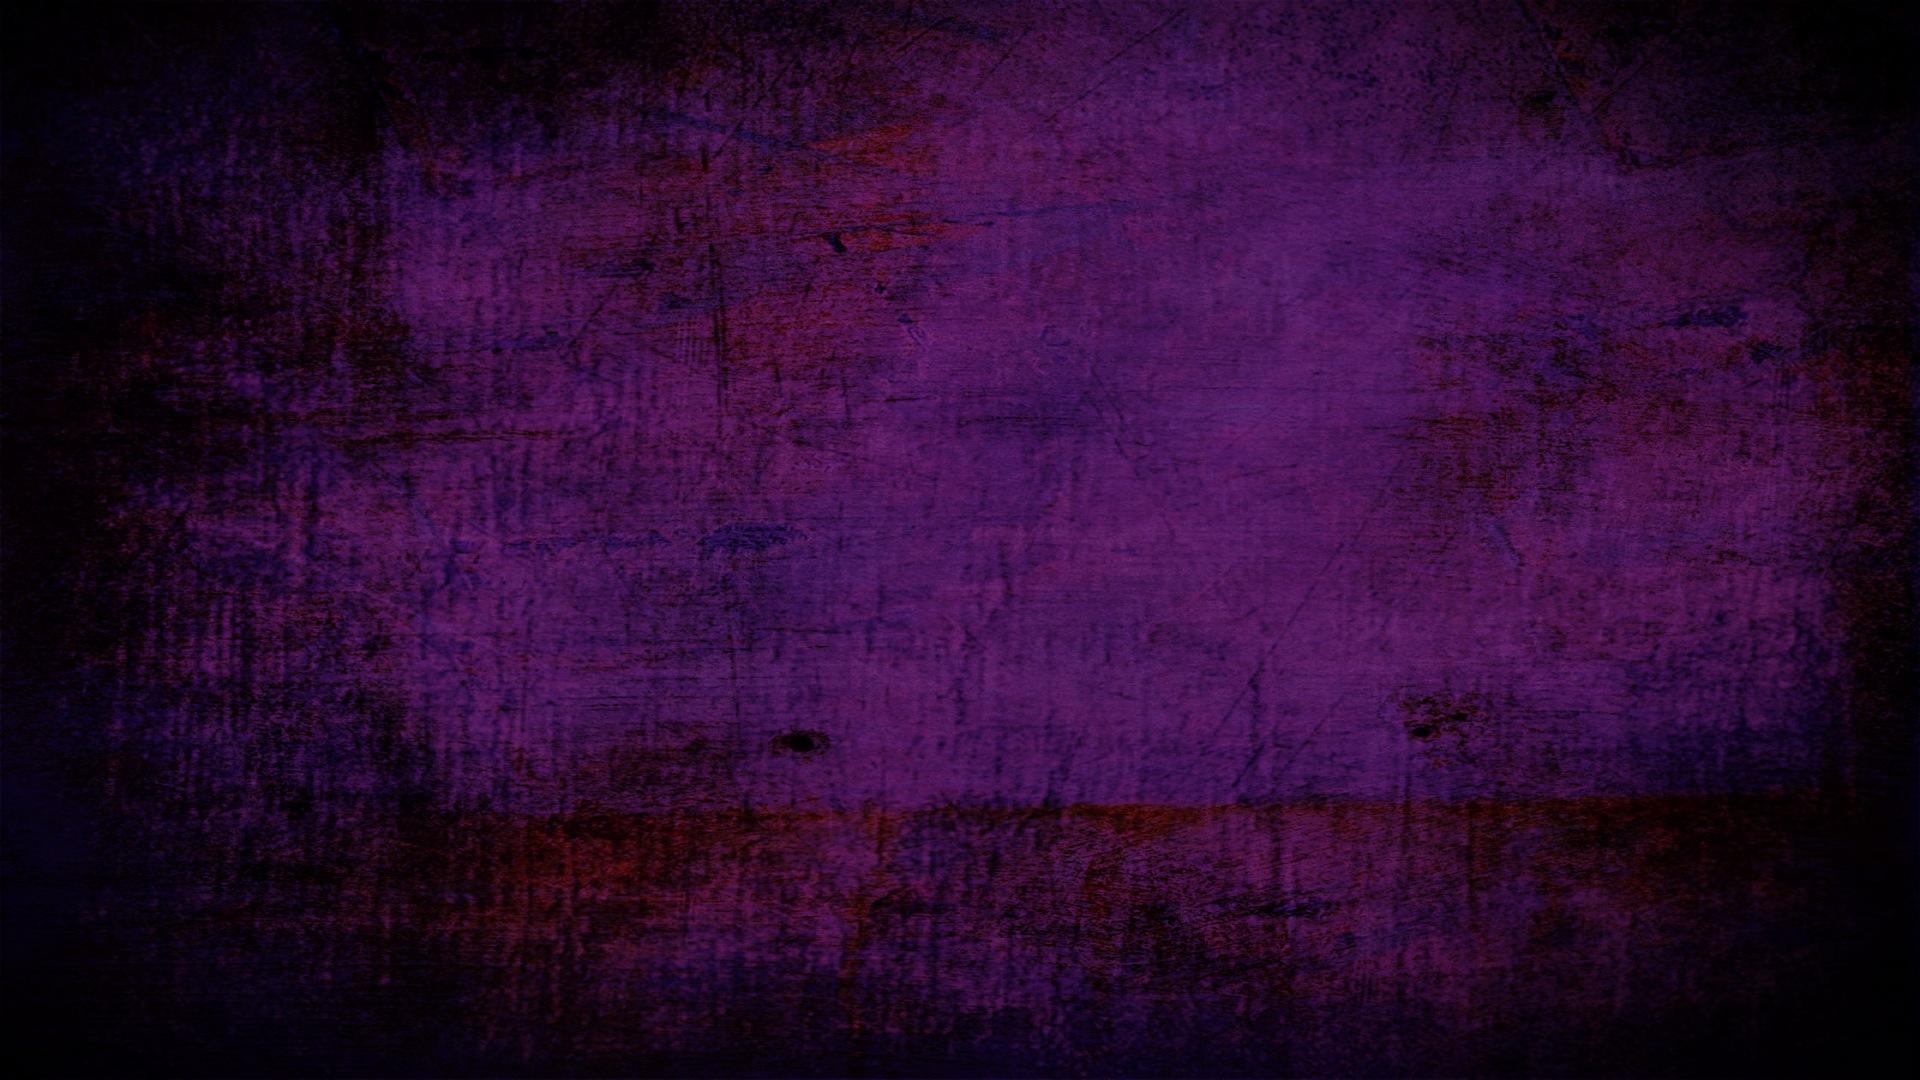 Dark Purple Background Wallpaper WallpaperSafari